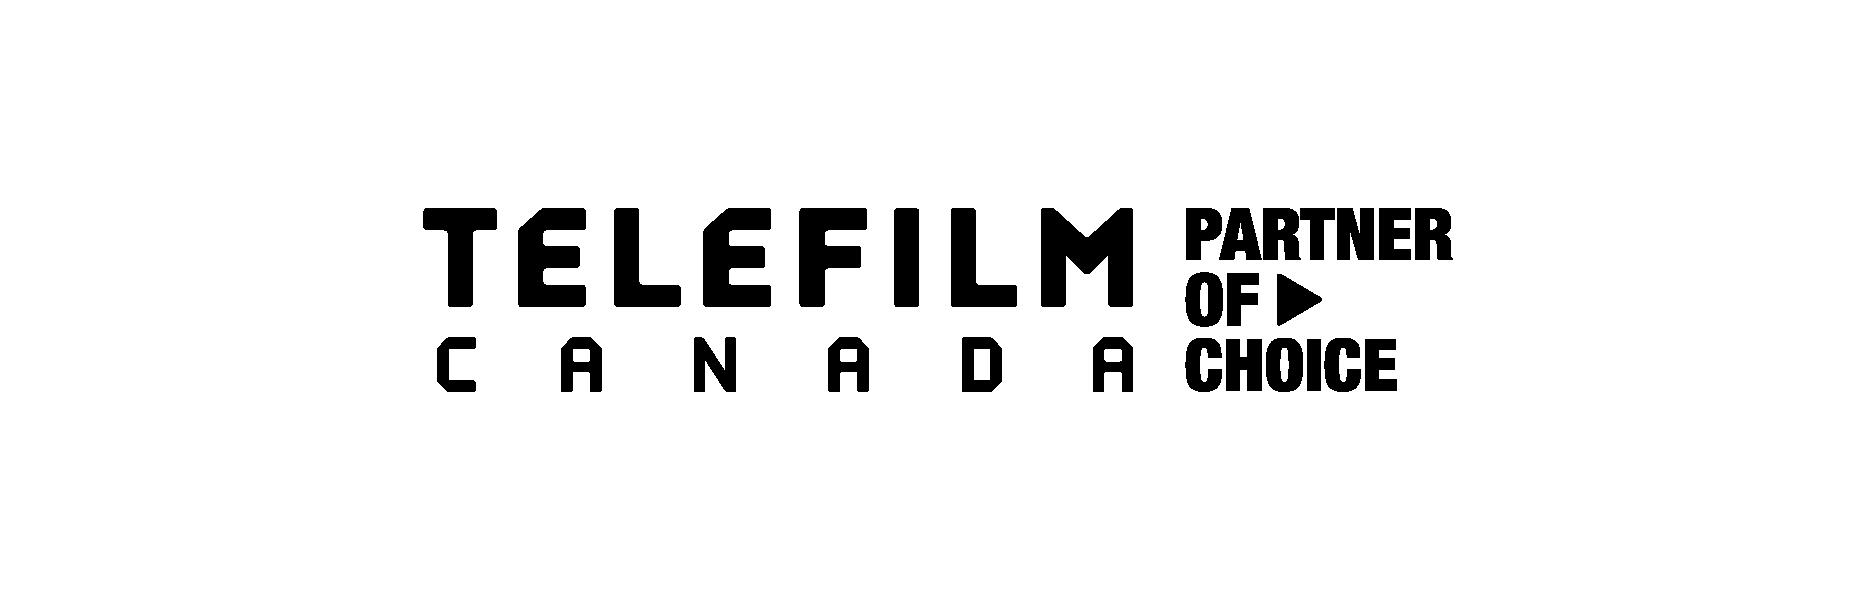 Telefilm logo that says Telefilm Canada, Partner of Choice with a small play symbol